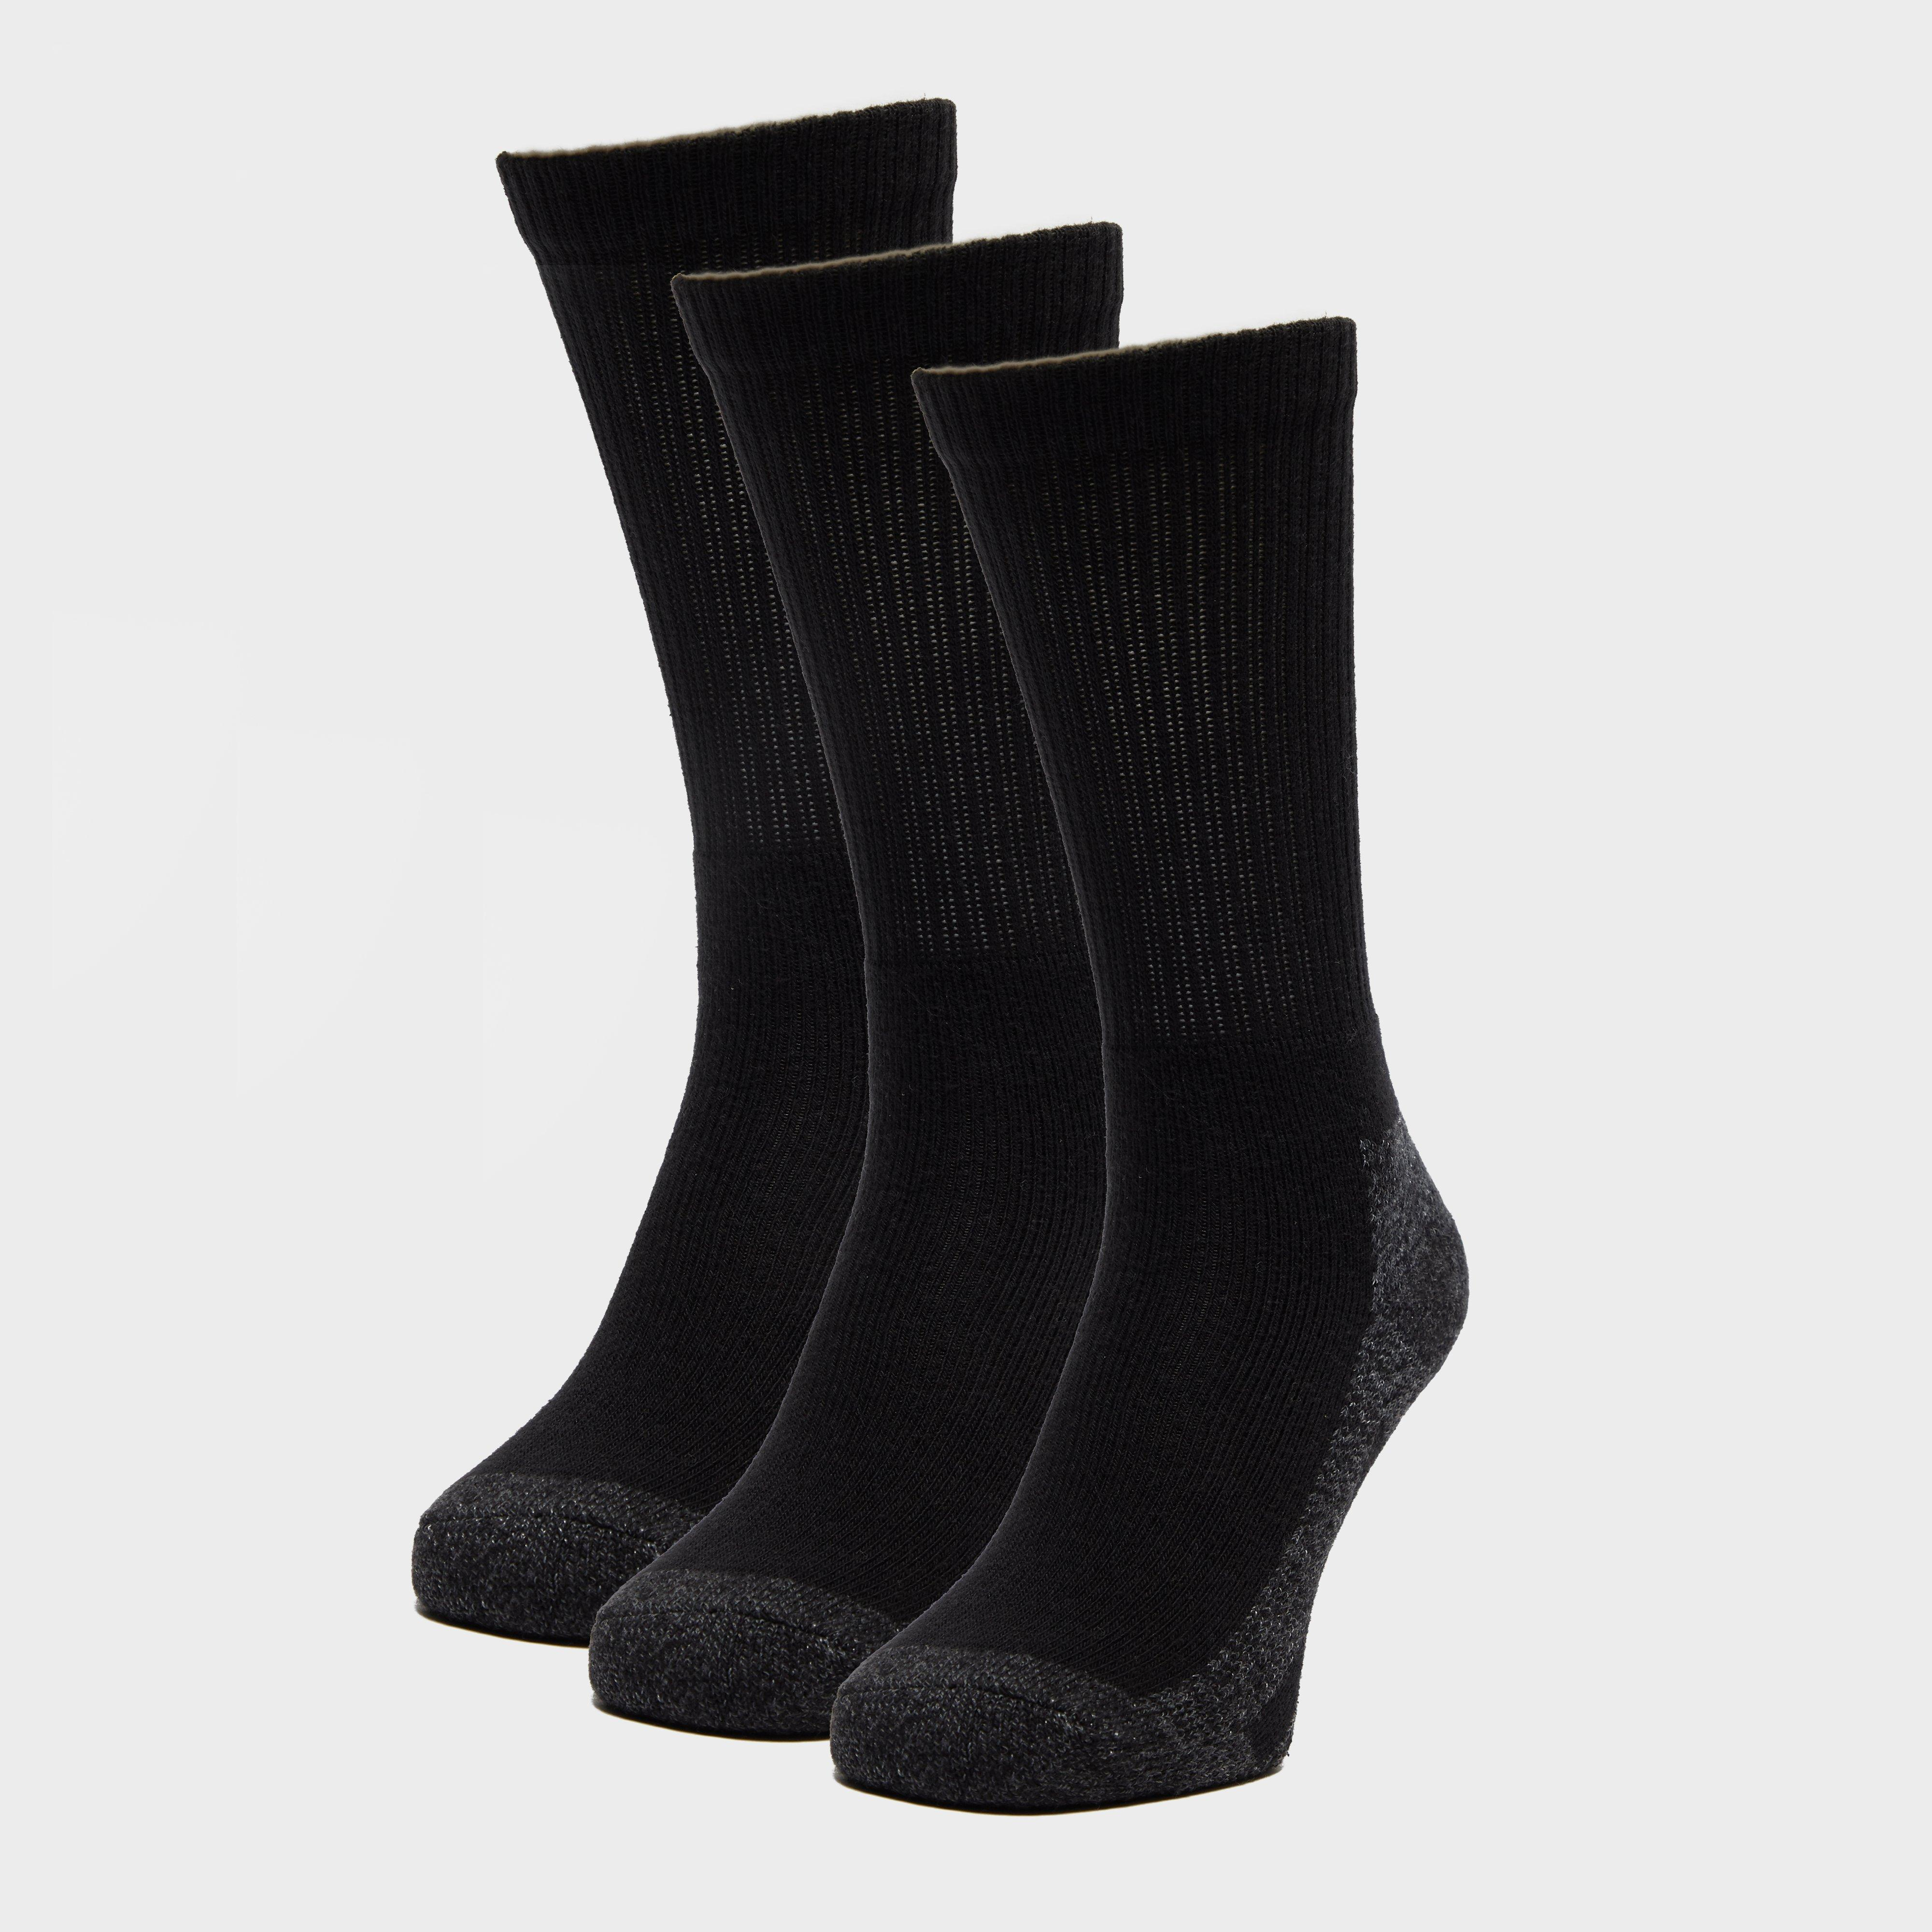 Salomon Socks Mens Brilliant Alpine Sock  Turquoise